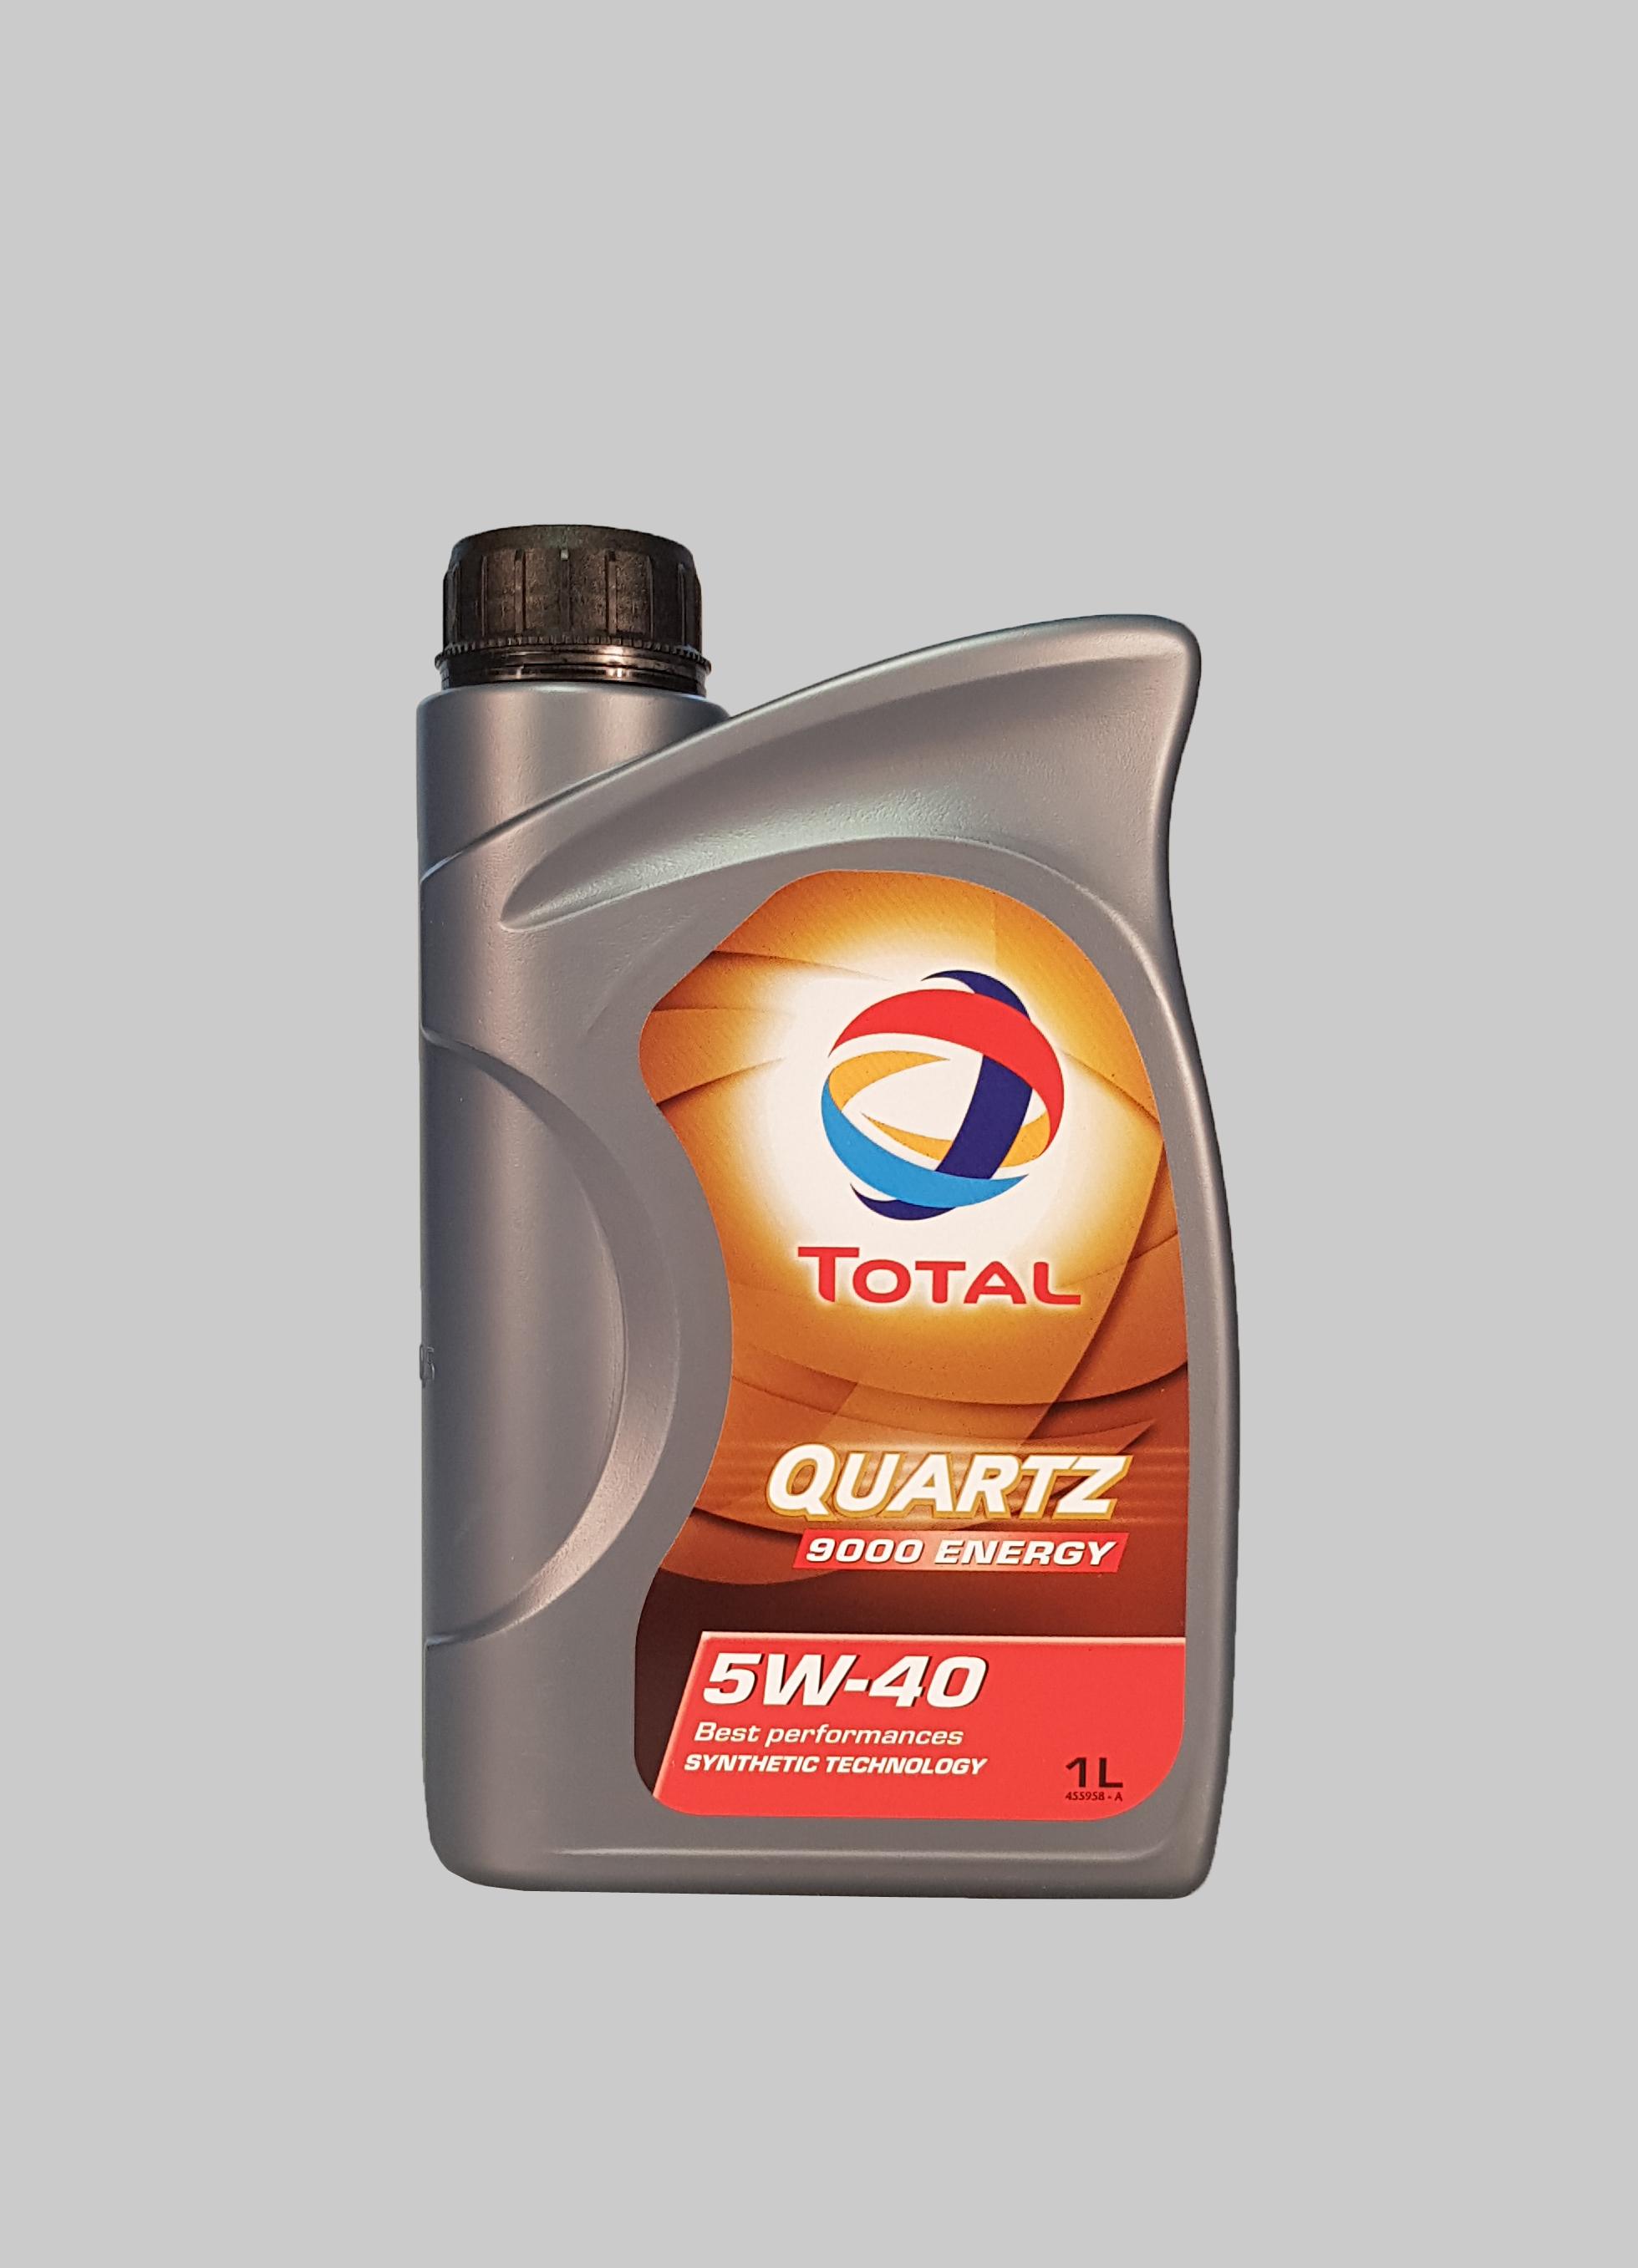 Total Quartz 9000 Energy 5W-40 1 Liter